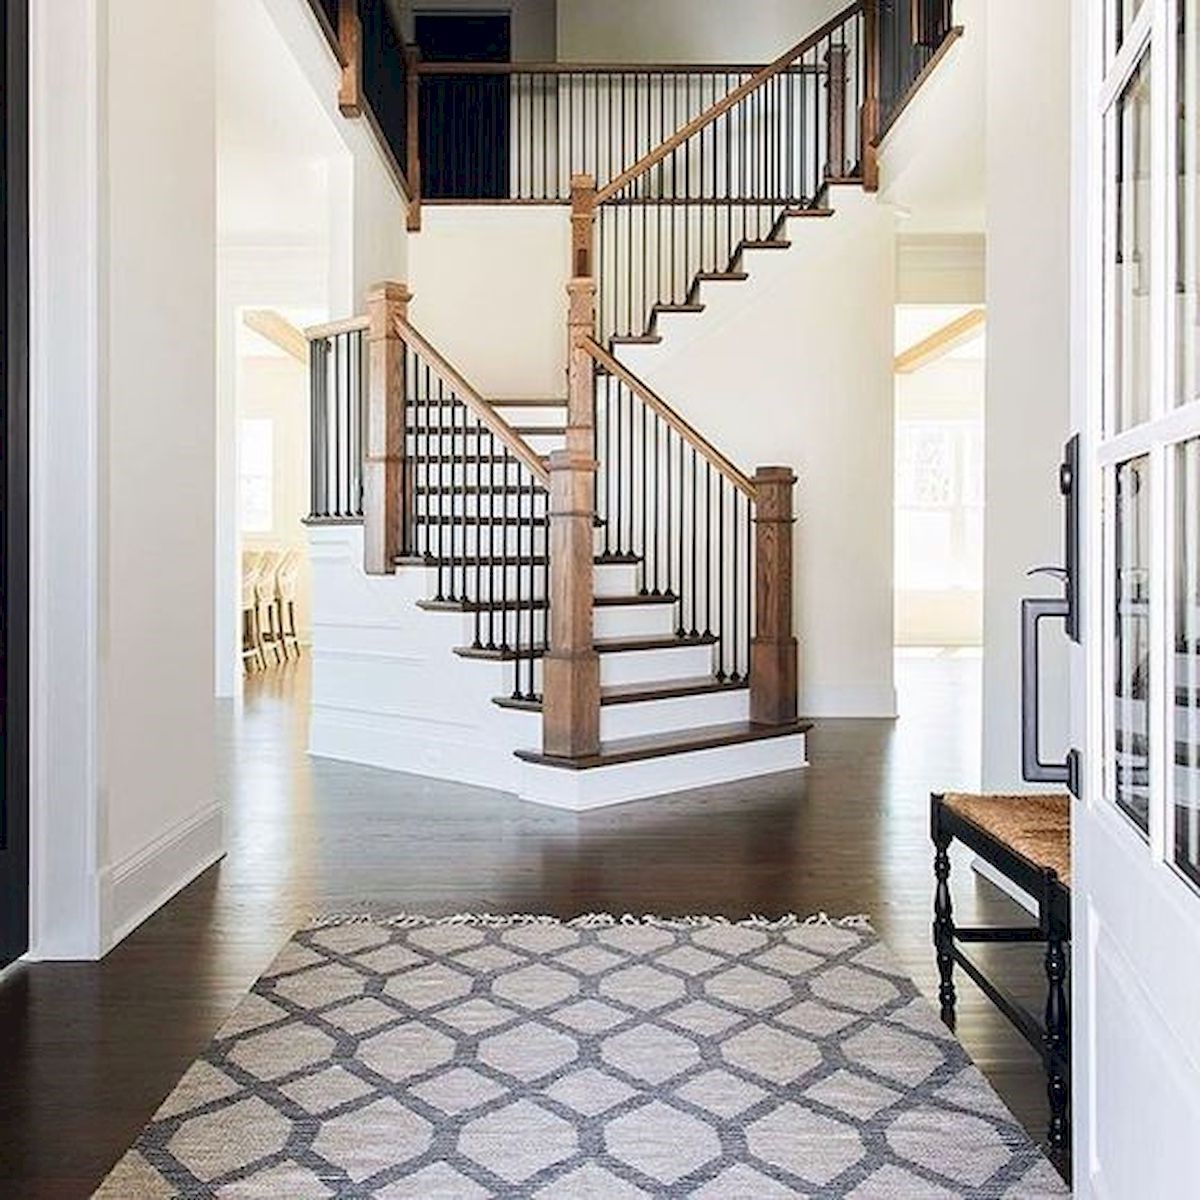 Escalier en bois simple.